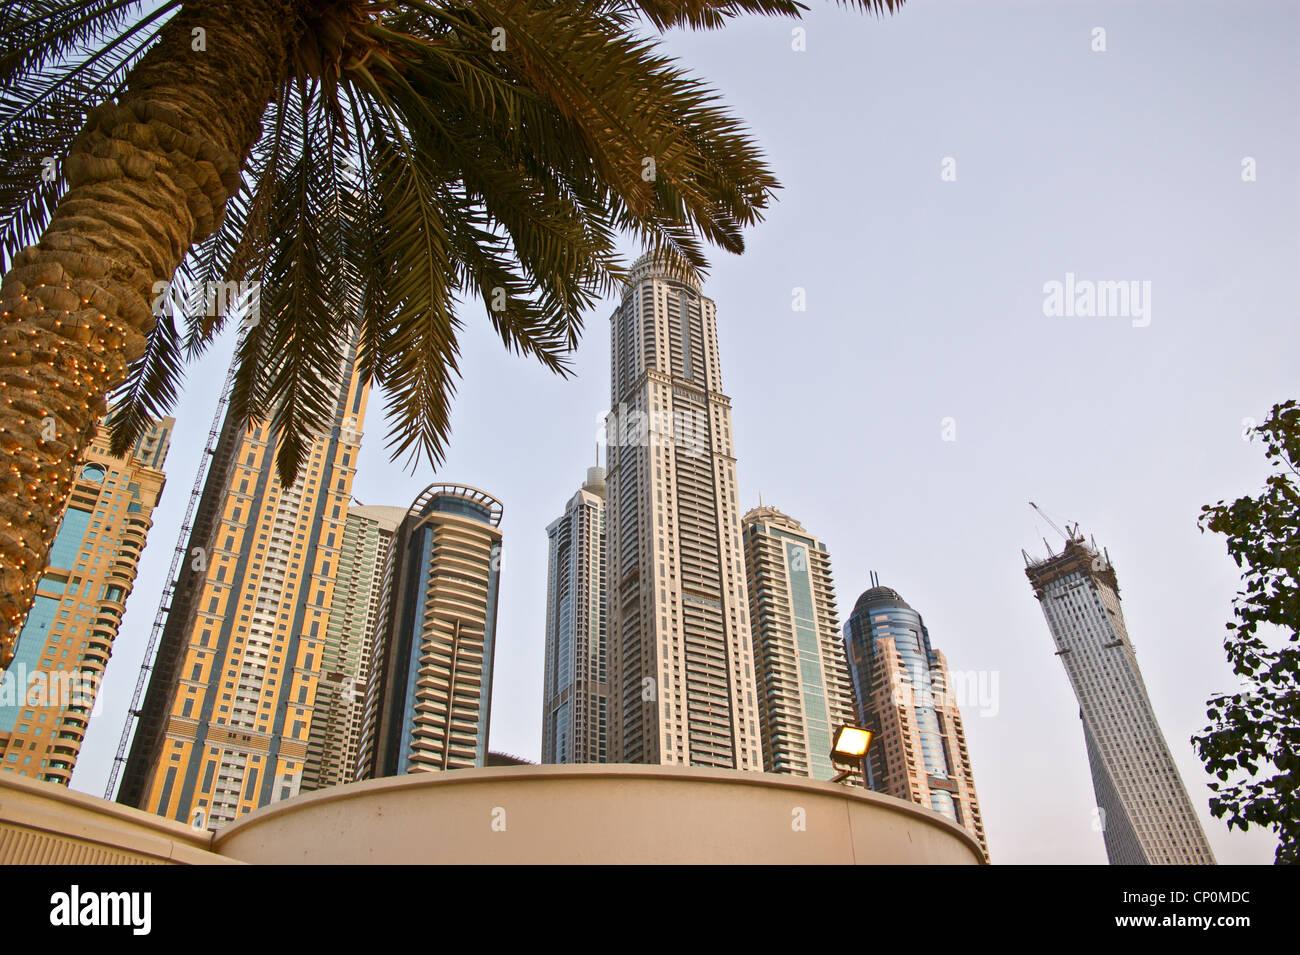 Skyscrapers, Dubai Marina, Dubai, United Arab Emirates. Marriott Hotel, Cayan Tower - Stock Image